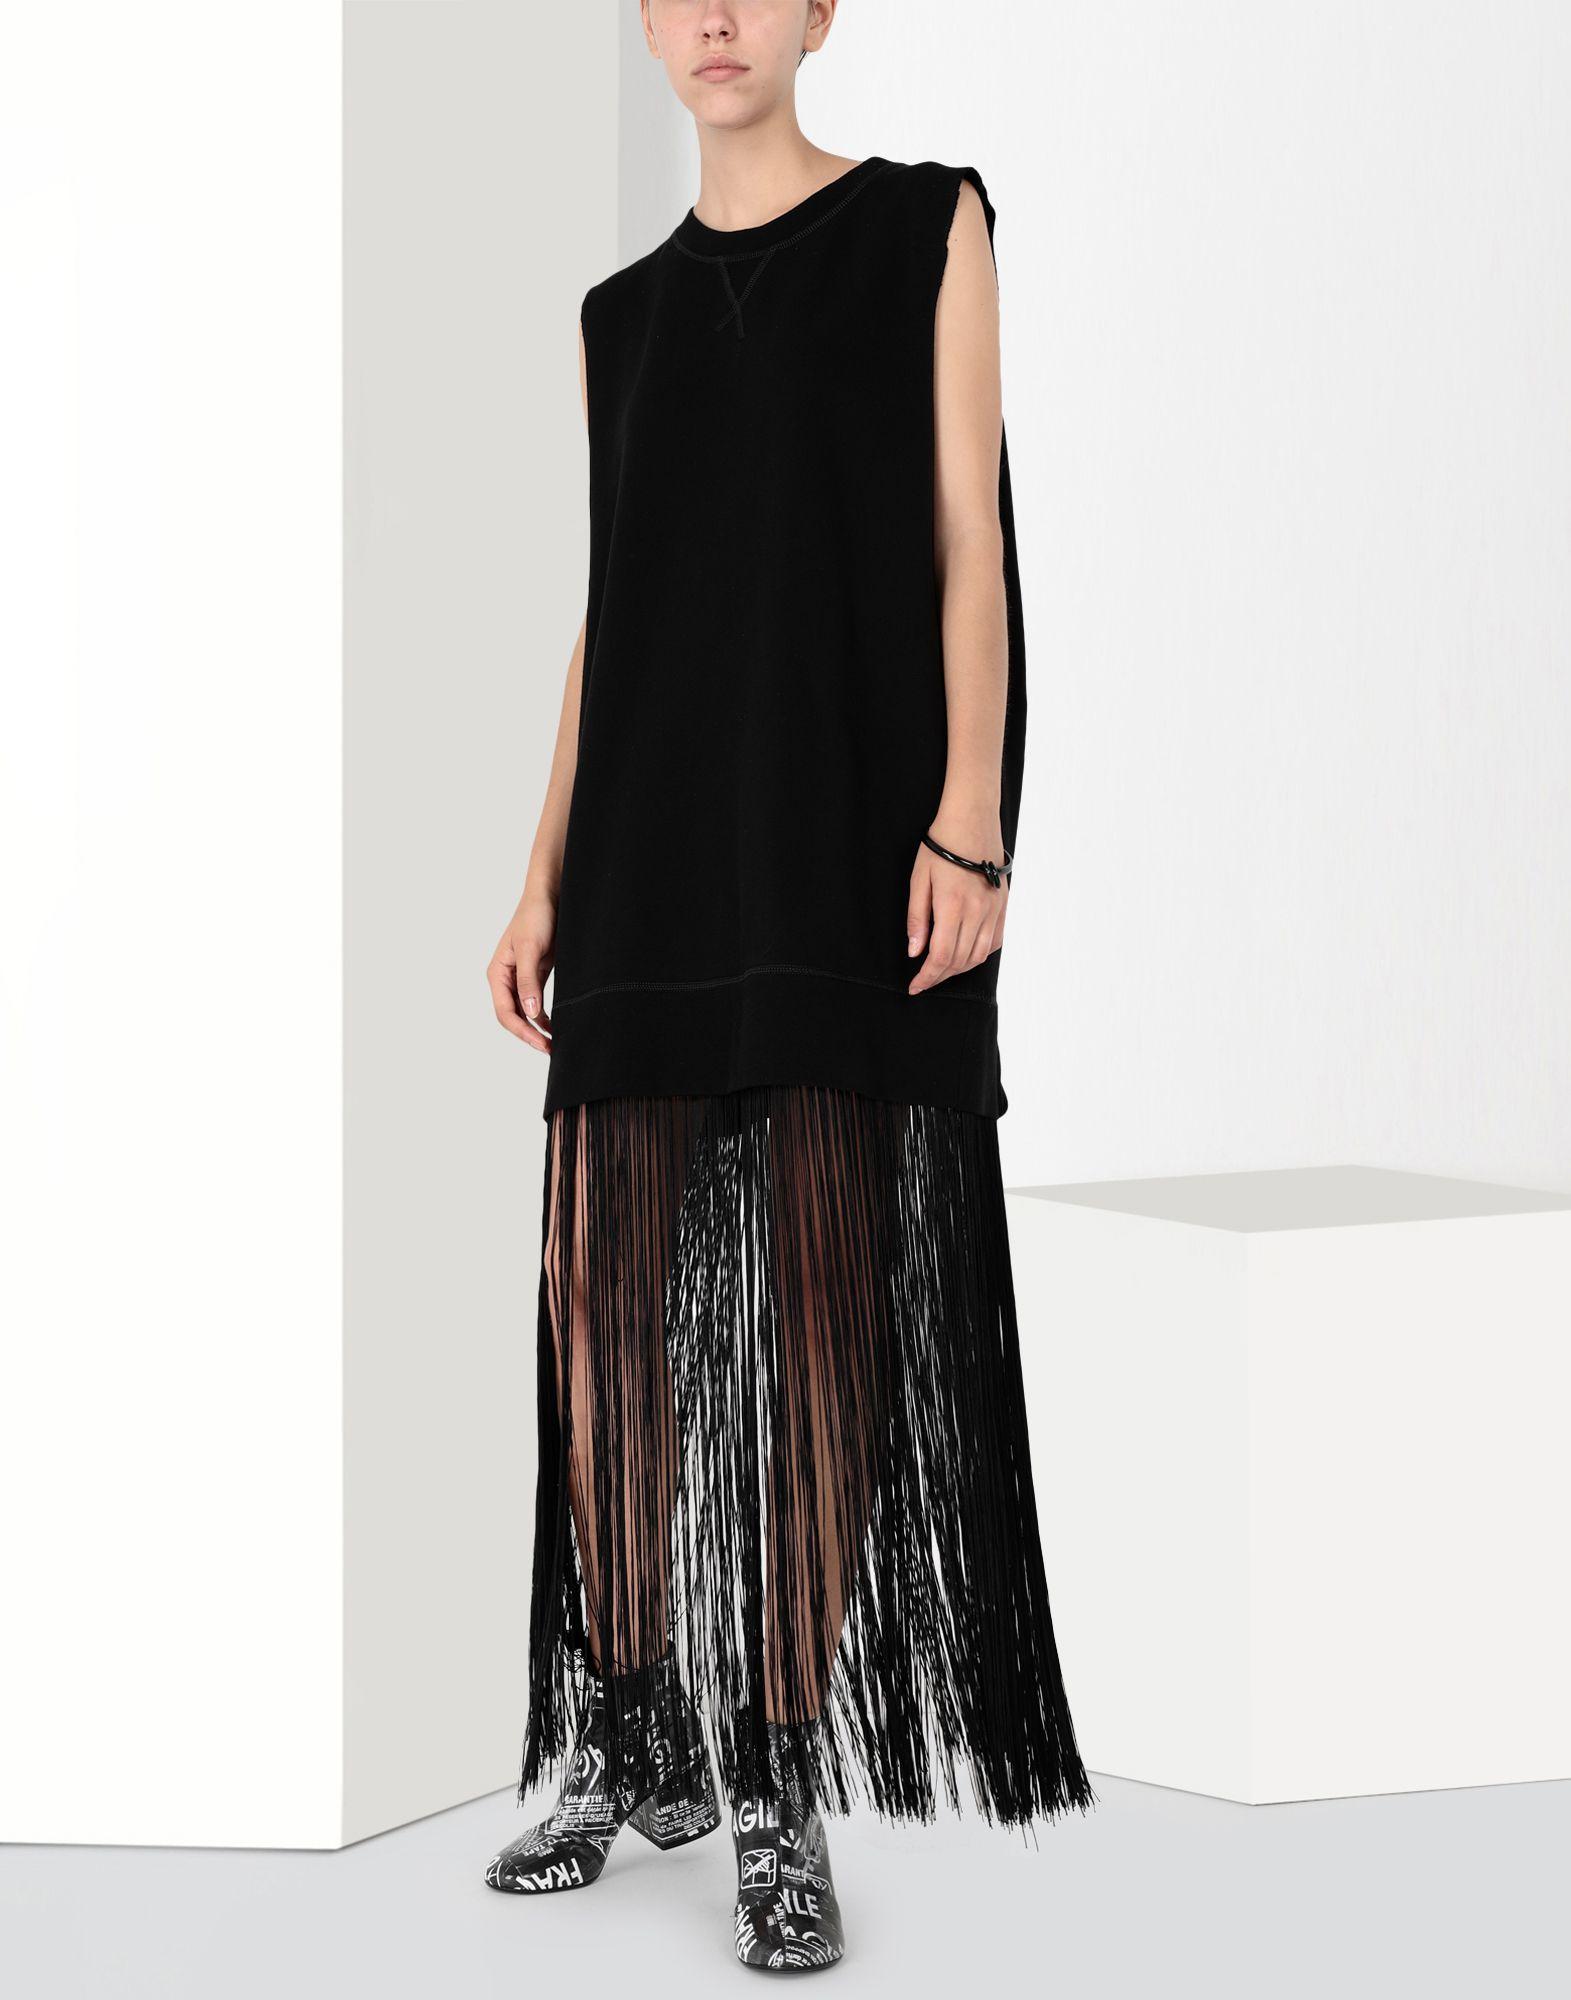 MM6 MAISON MARGIELA Jumper dress with fringes Long dress Woman r